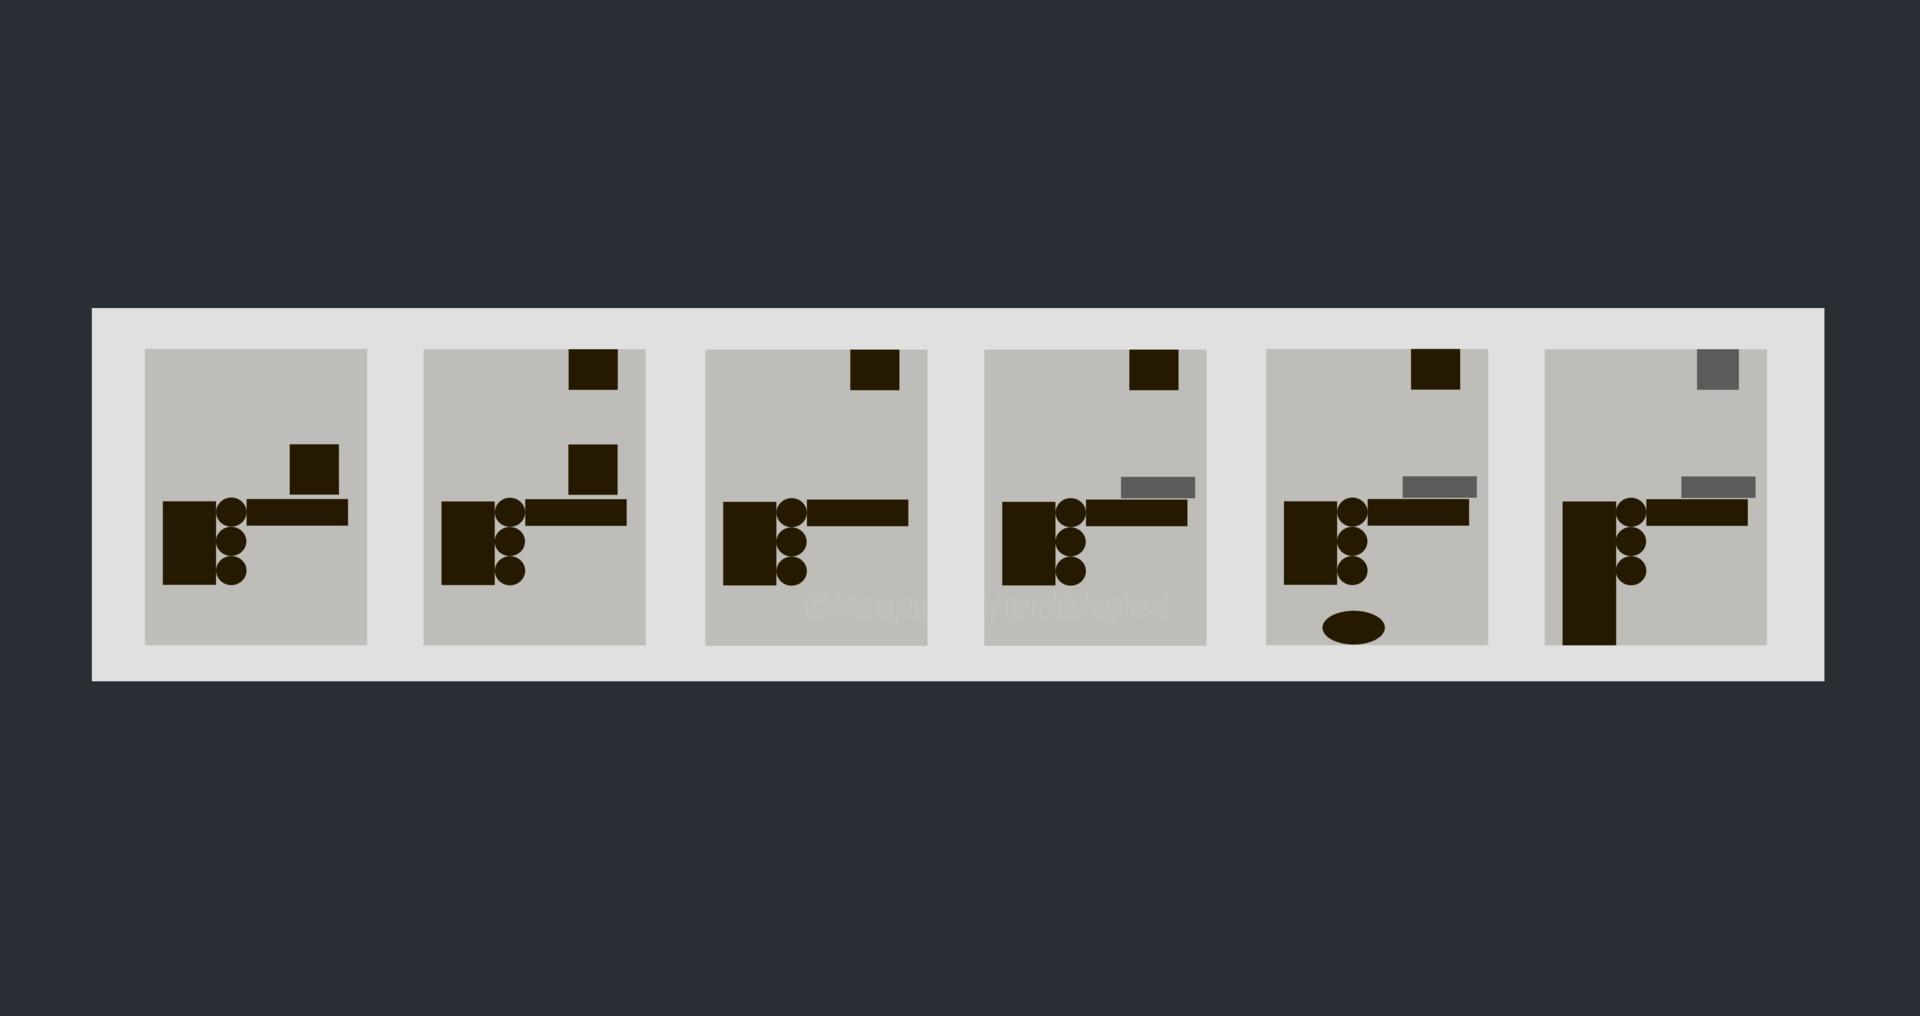 Gerald Shepherd - Variation Sequence